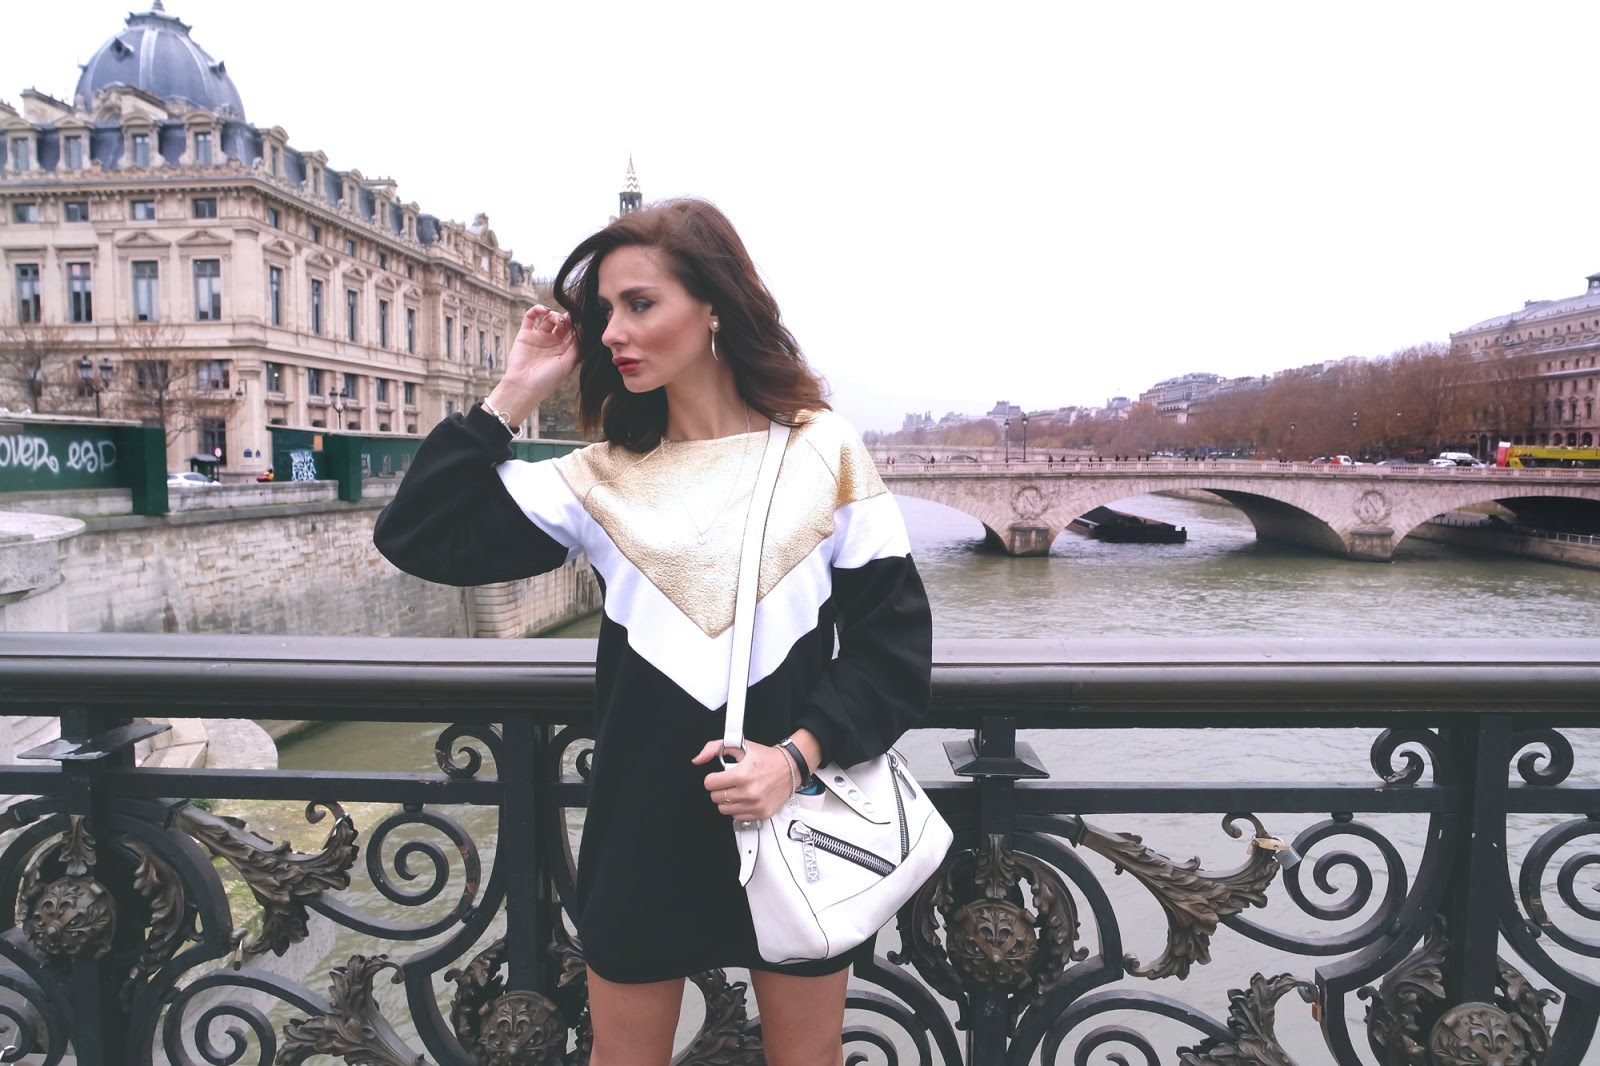 Pont Notre Dame with Gaelle Bonheur!